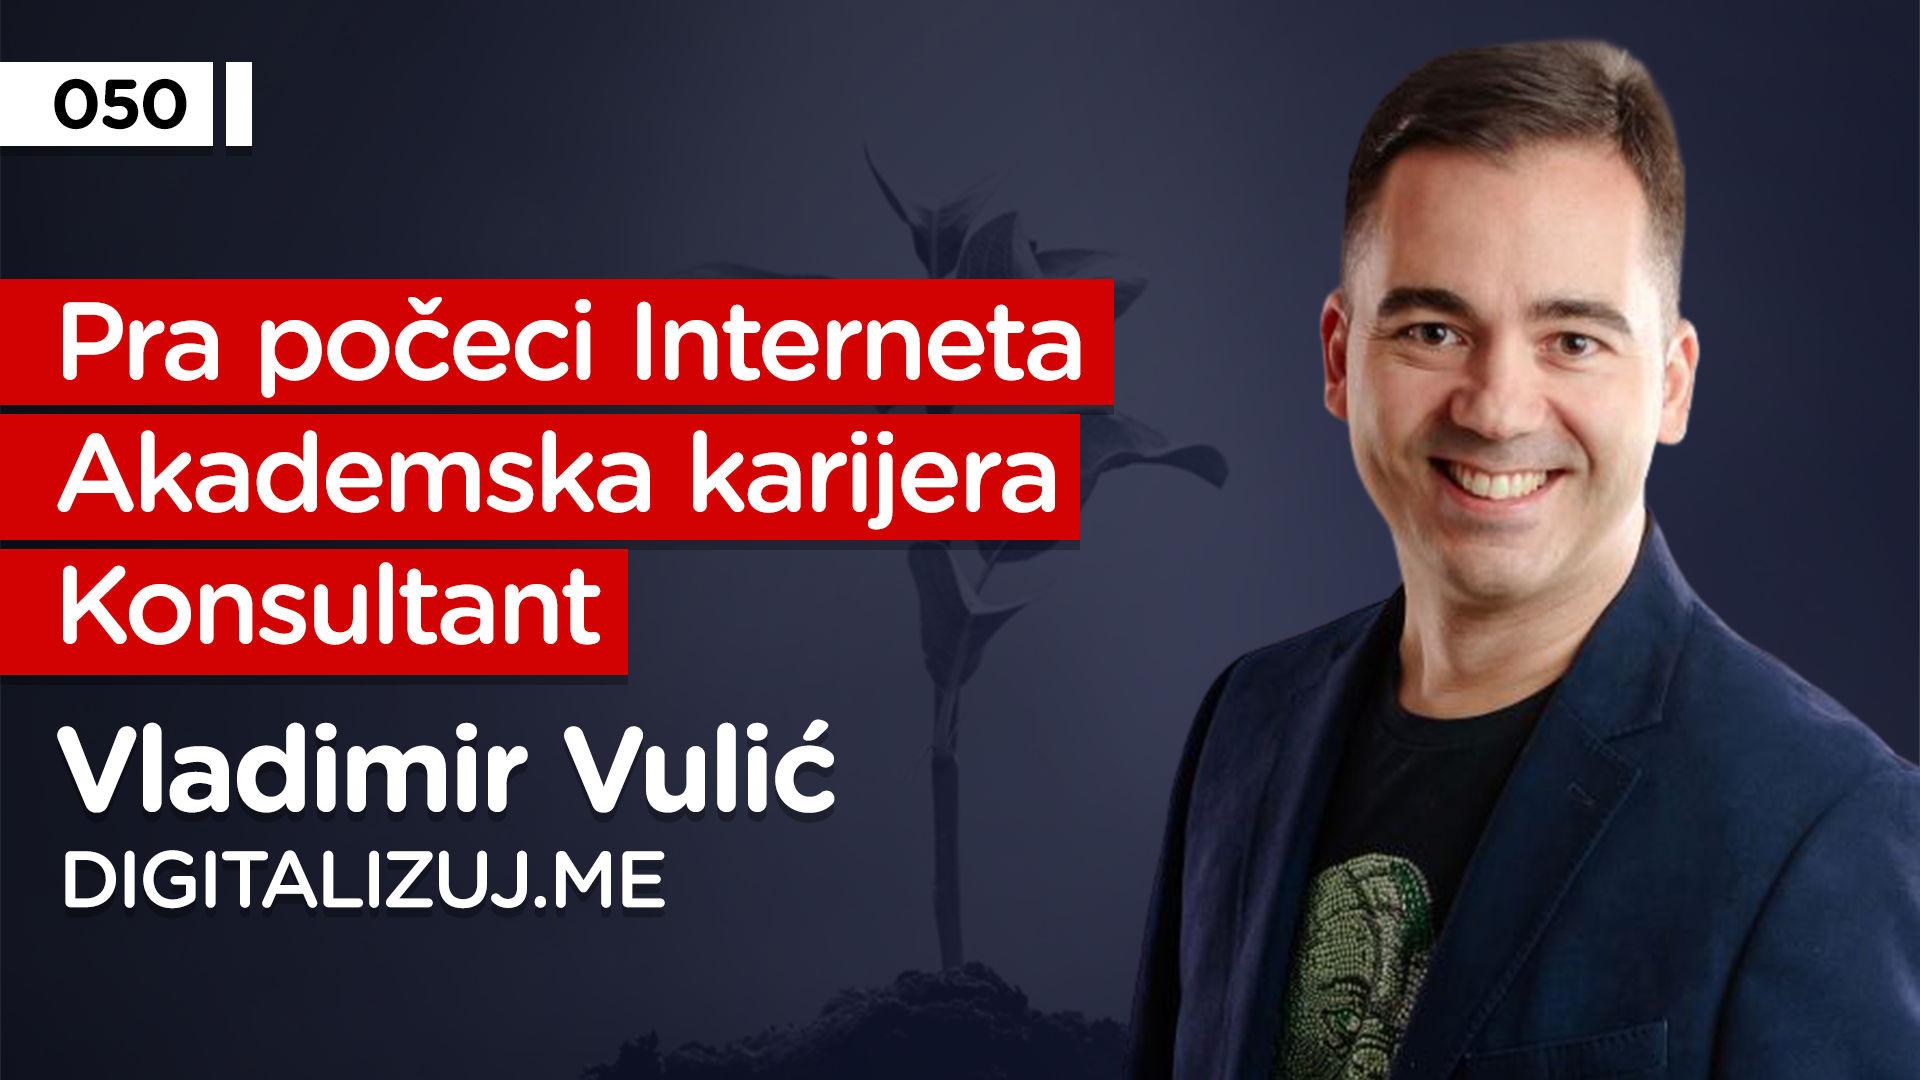 EP050: Vladimir Vulić